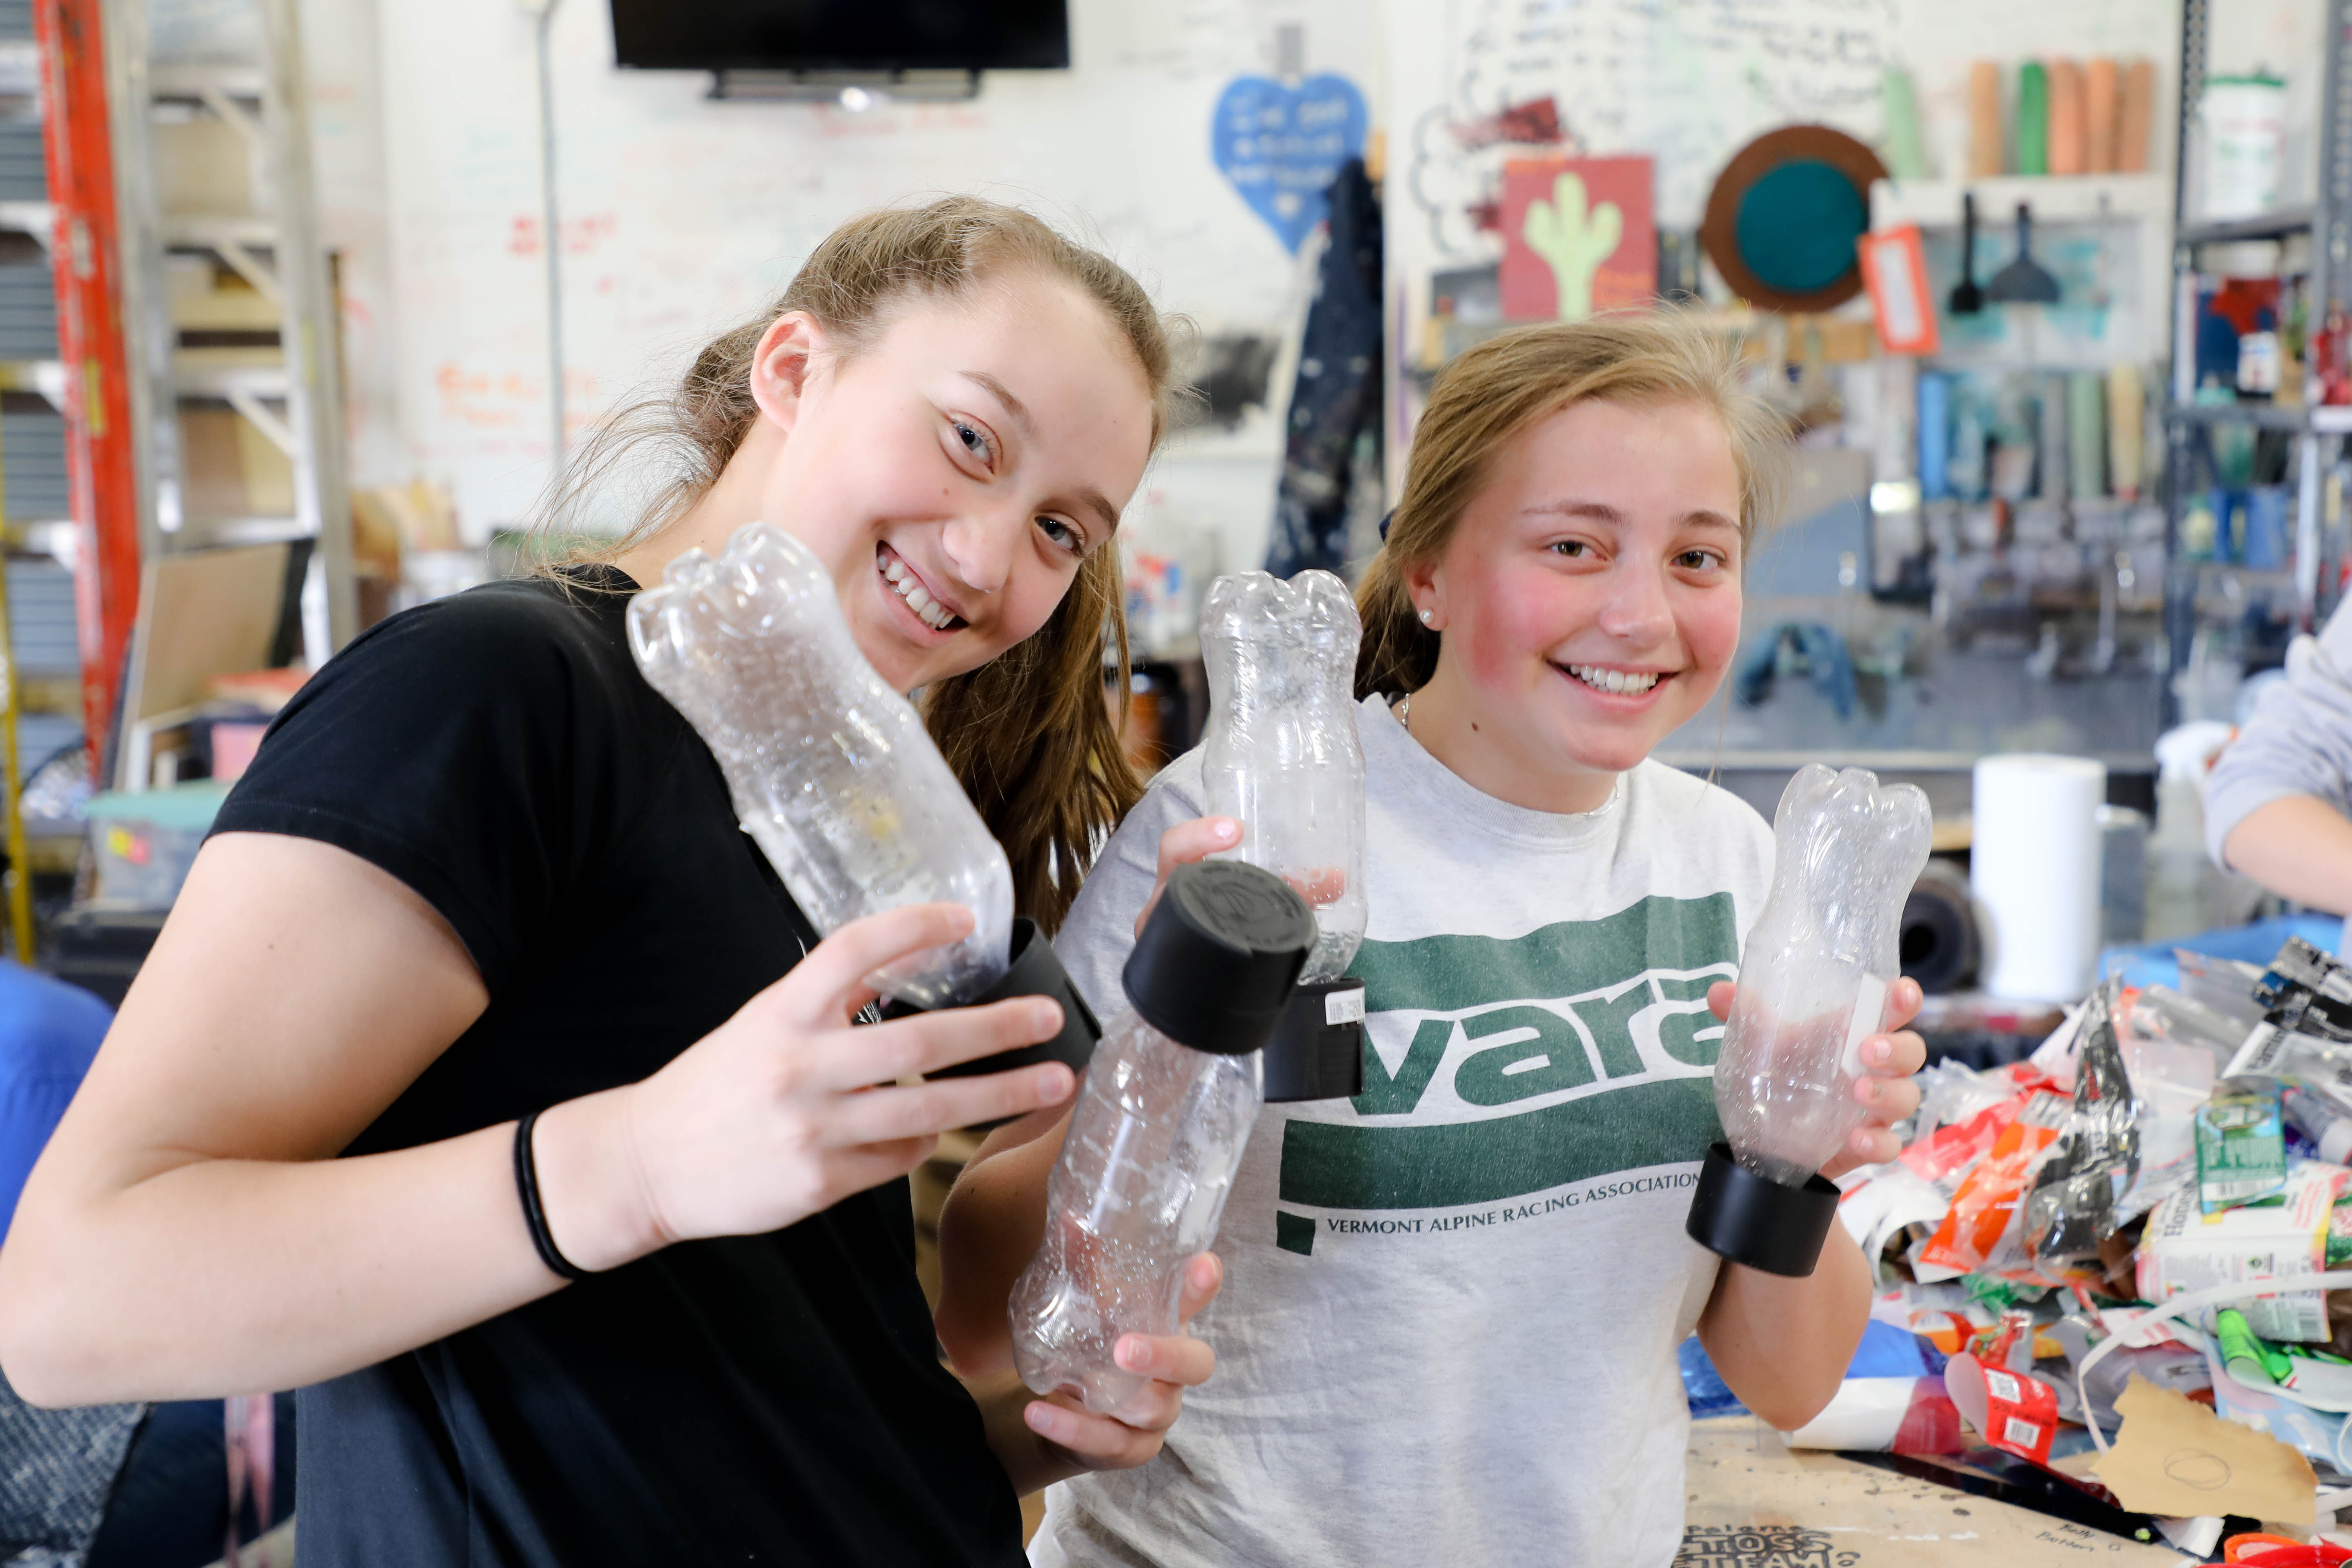 Proctor Academy Environmental Stewardship and Sustainability